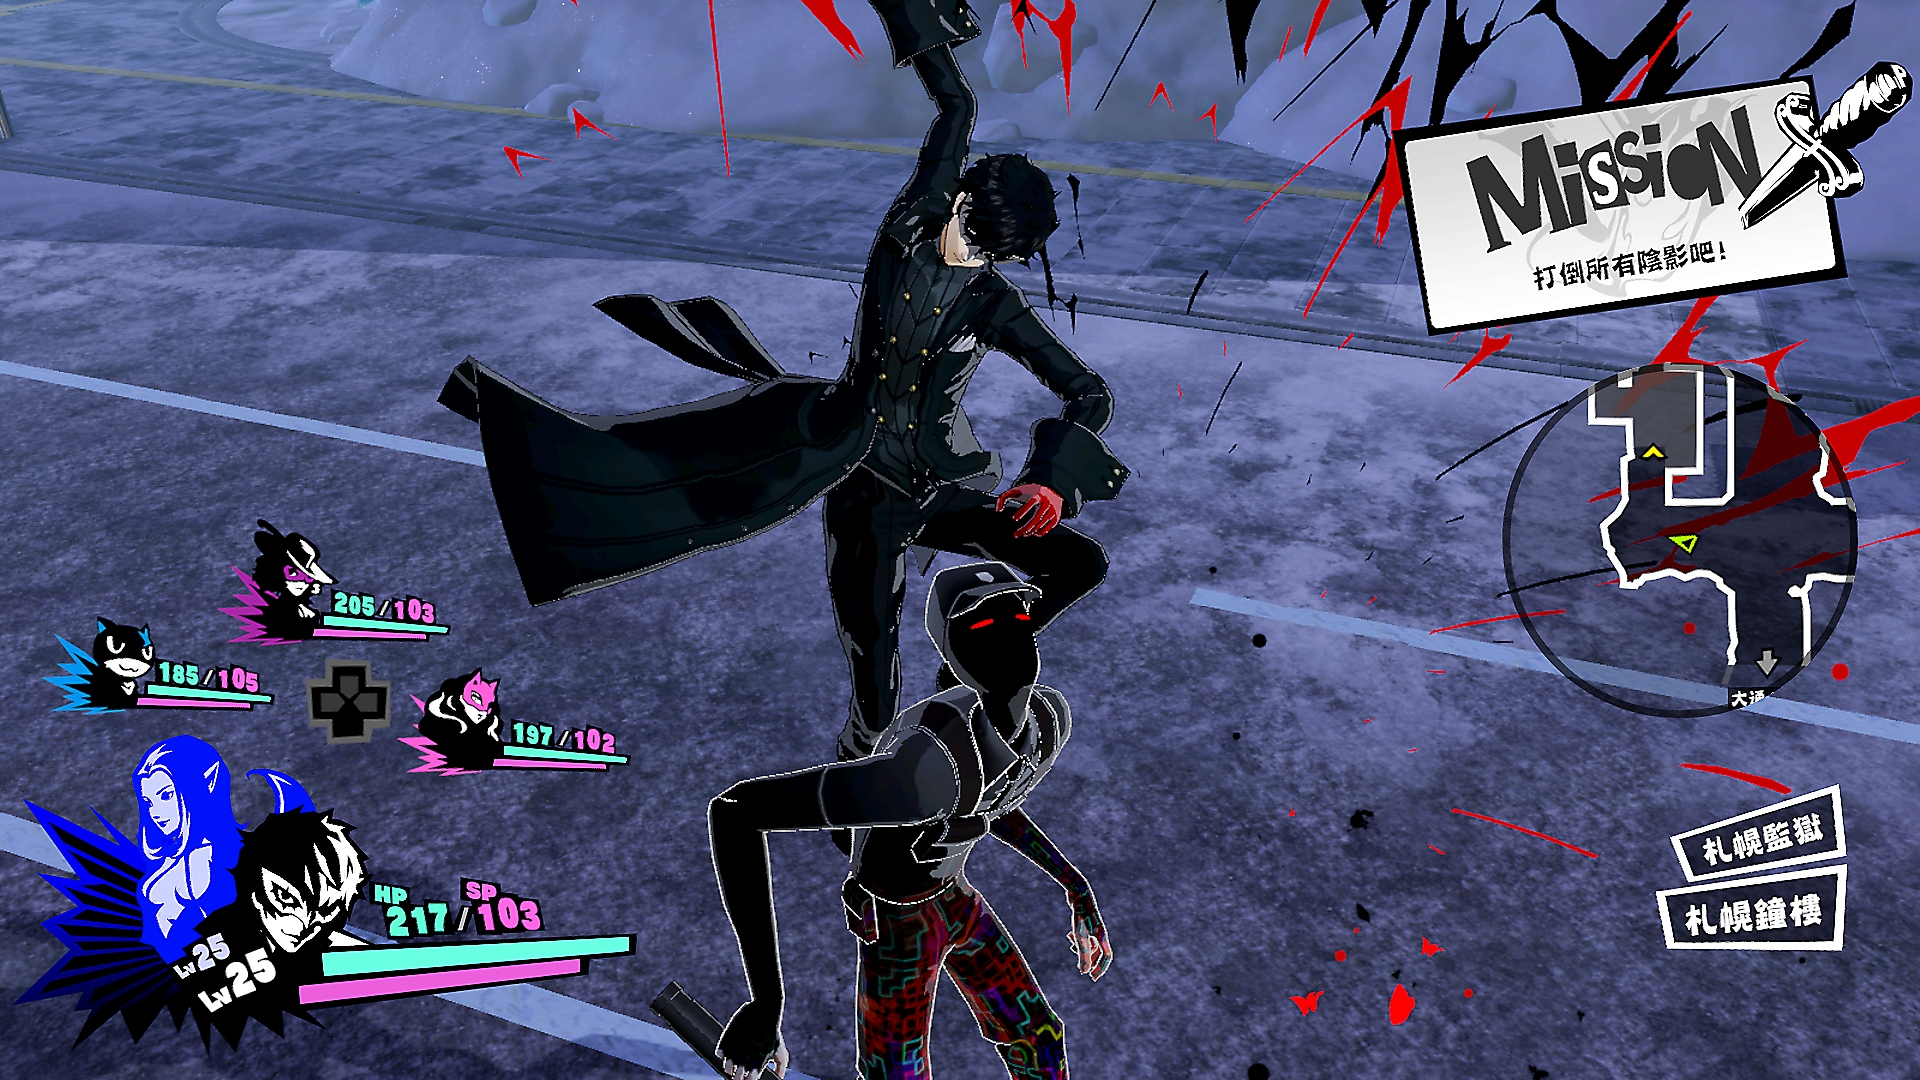 Persona 5 STRIKERS - Gallery Screenshot 8